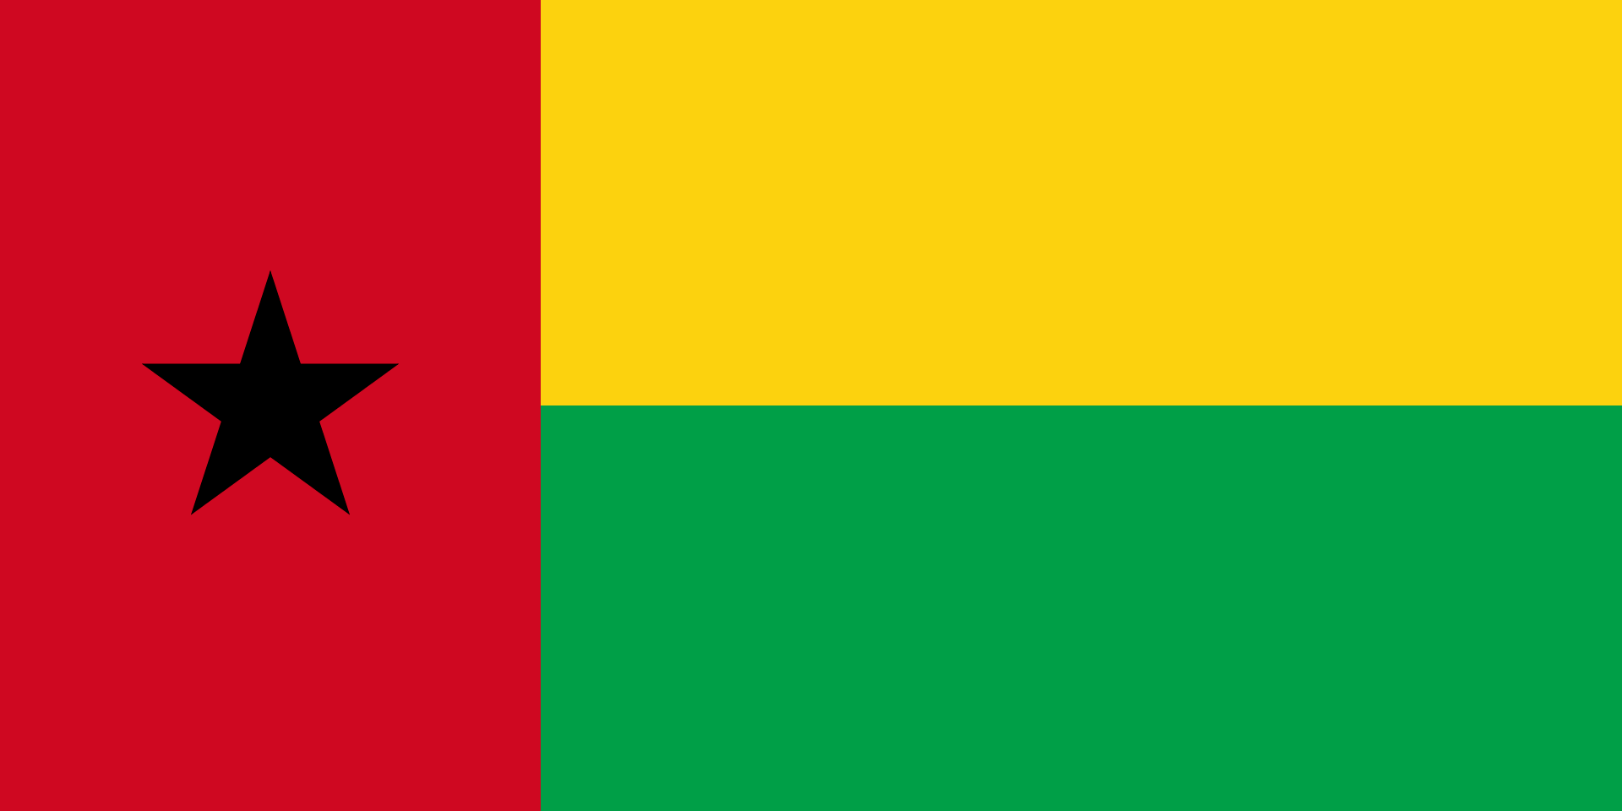 Flagge im Querformat Land Guinea-Bissau 150x100 cm